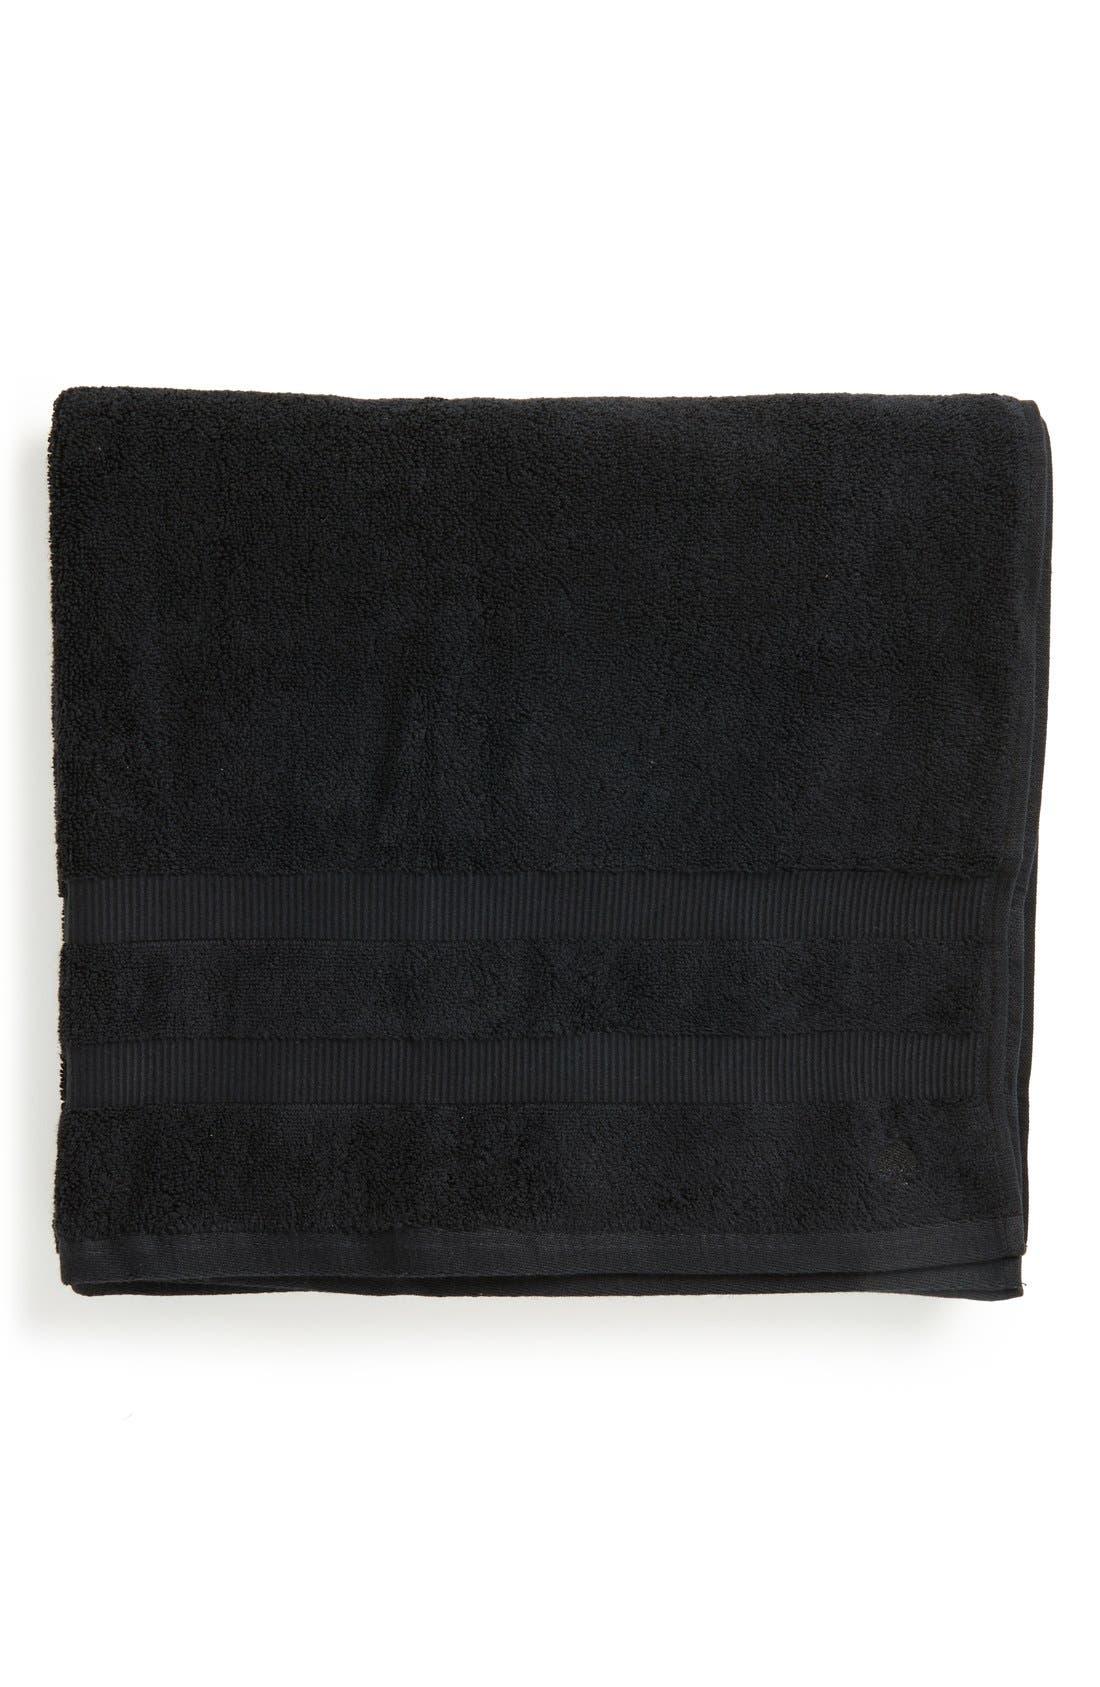 'chattam stripe' bath towel,                             Main thumbnail 1, color,                             BLACK